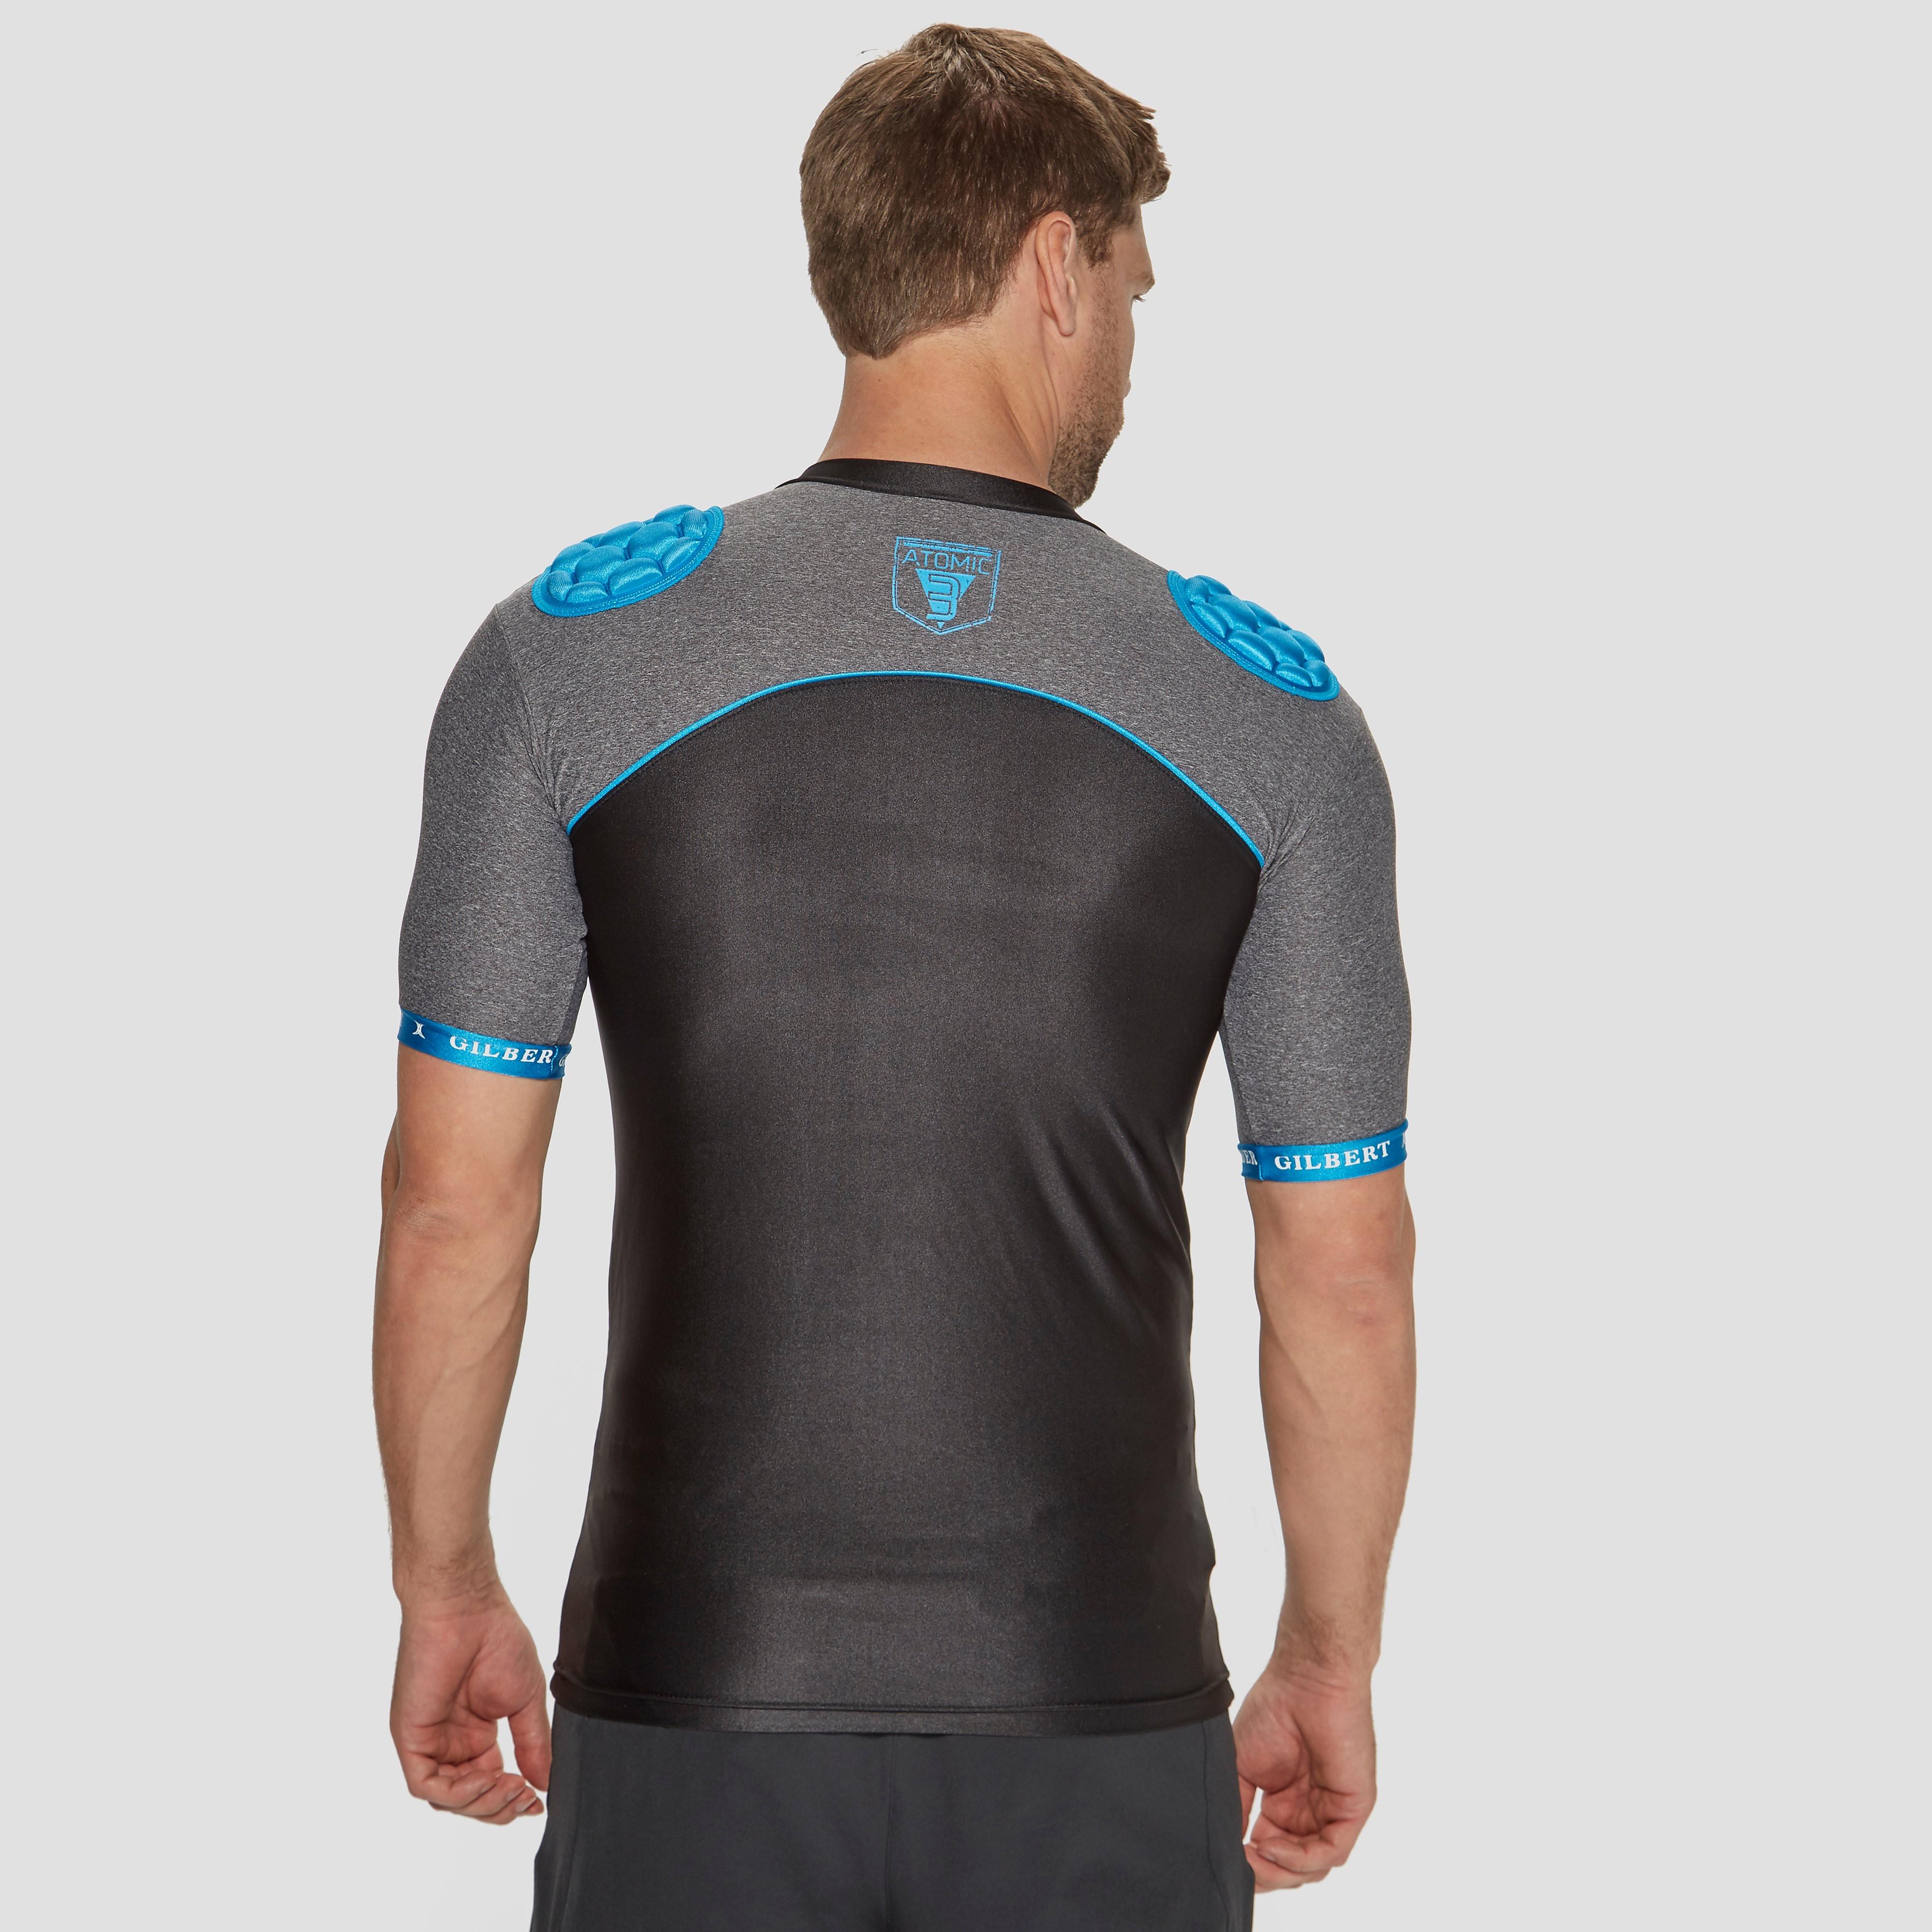 Gilbert Atomic V3 Body Armour Men's Rugby Vest